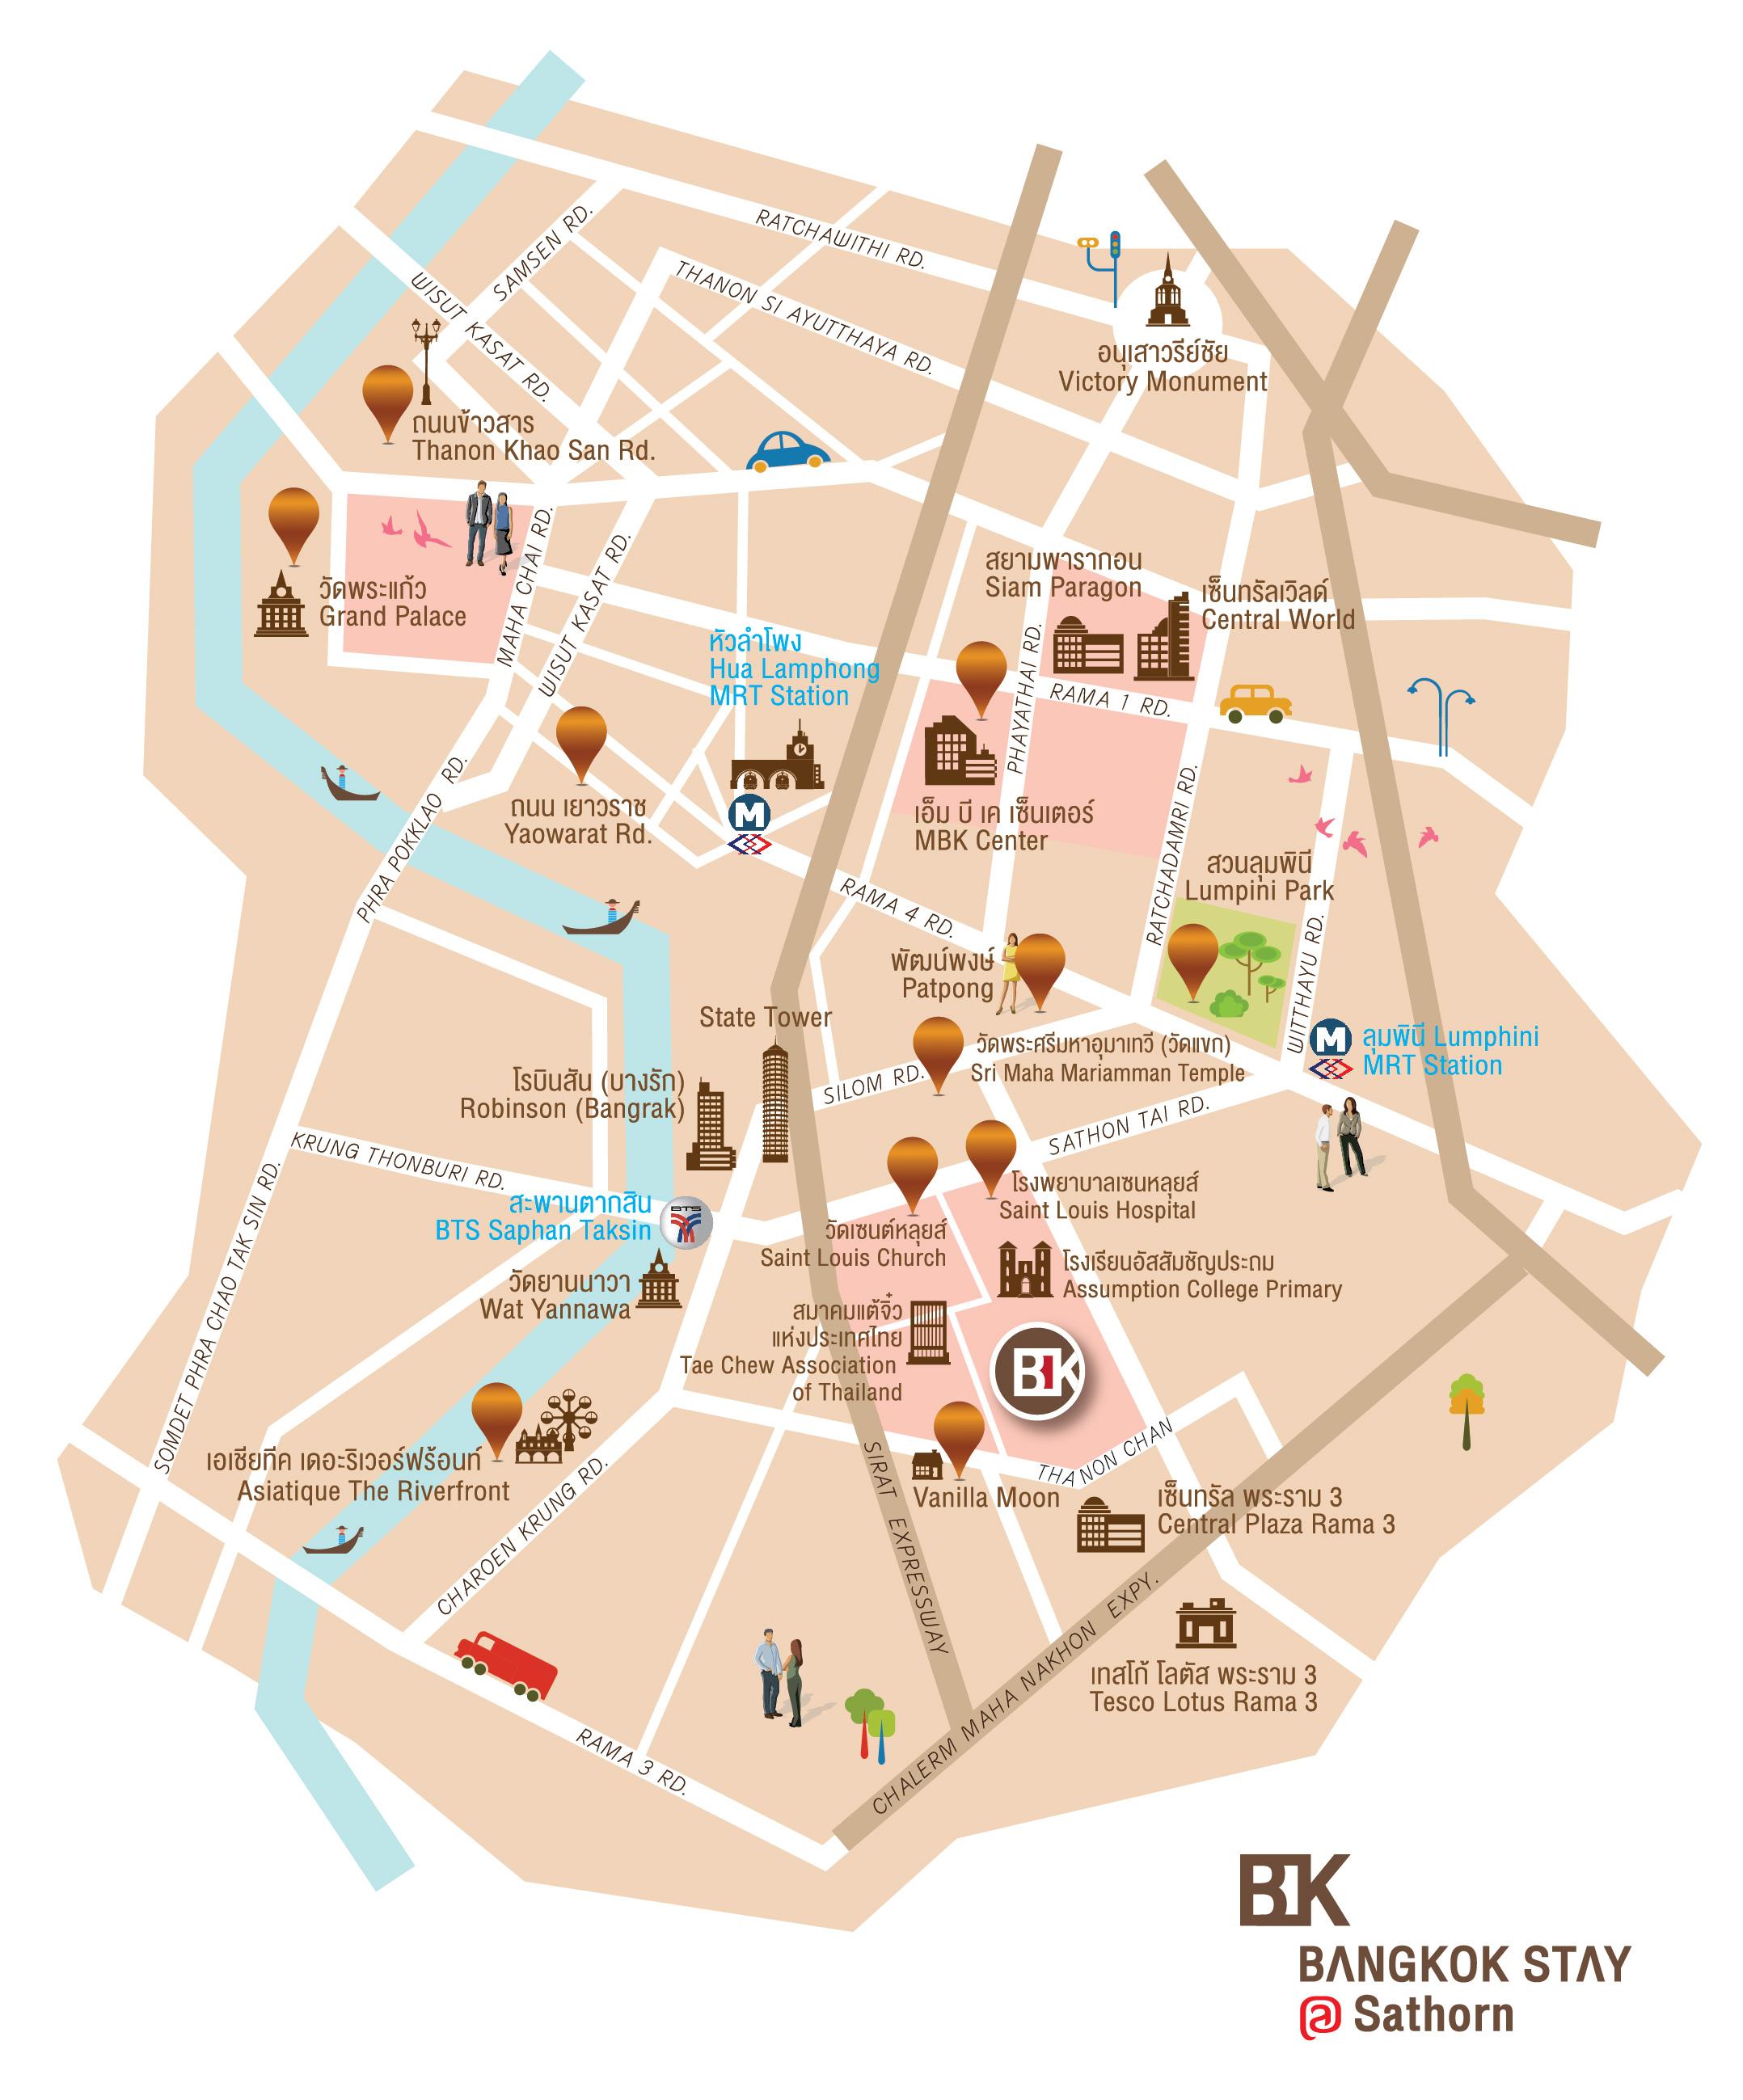 BKK-Map-01